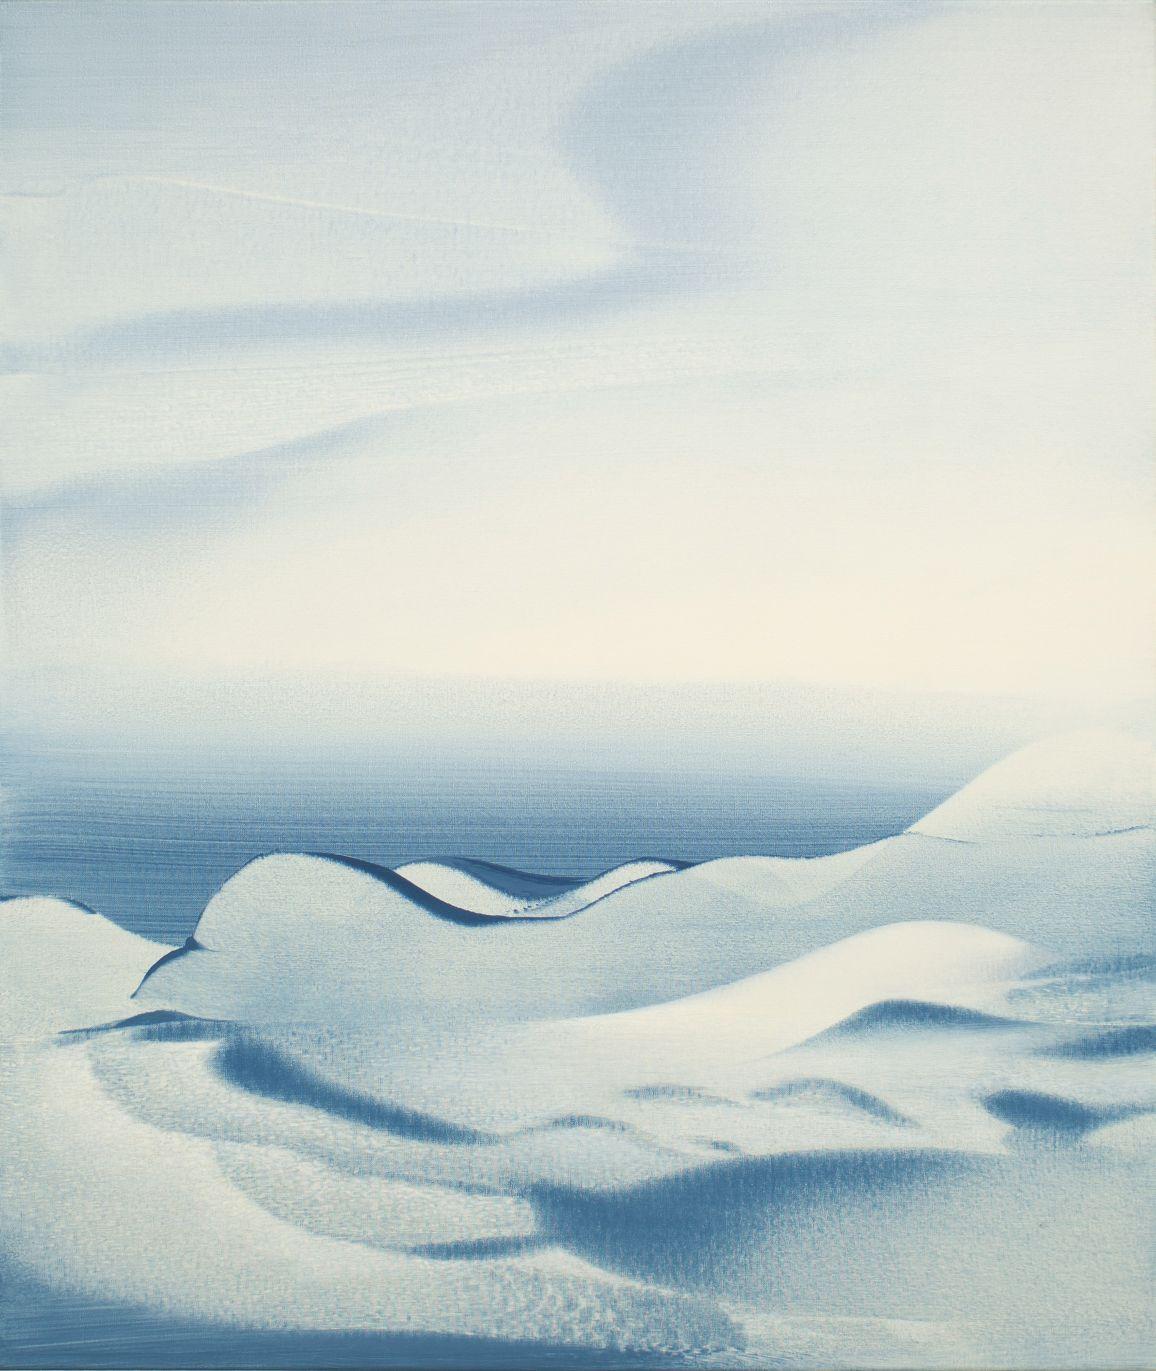 Eva Ullrich, Cloudform, The Auction Collective